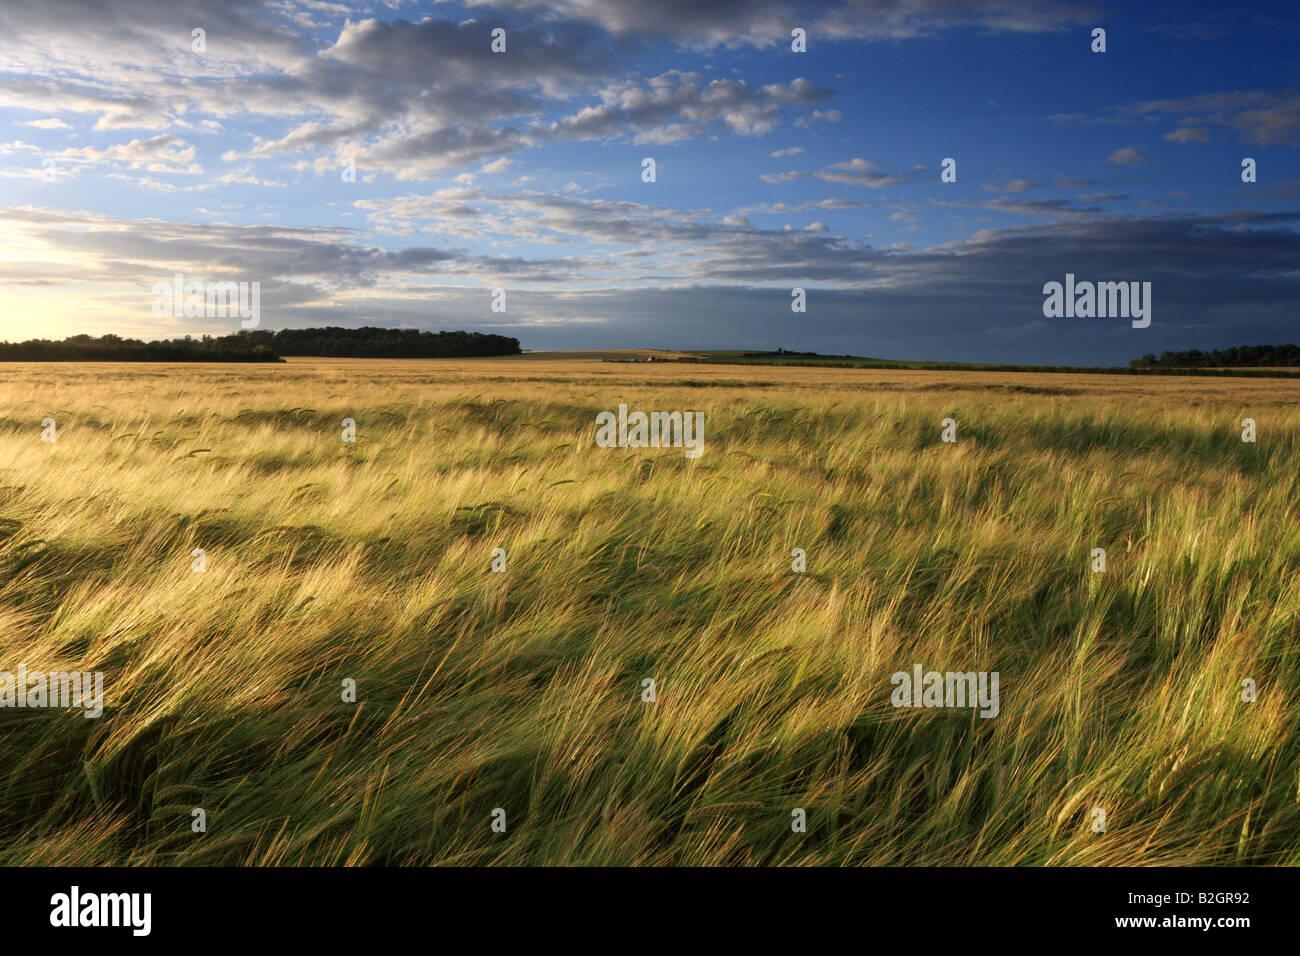 Barley field and Sunset looking towards Wandlebury, Cambridge. - Stock Image